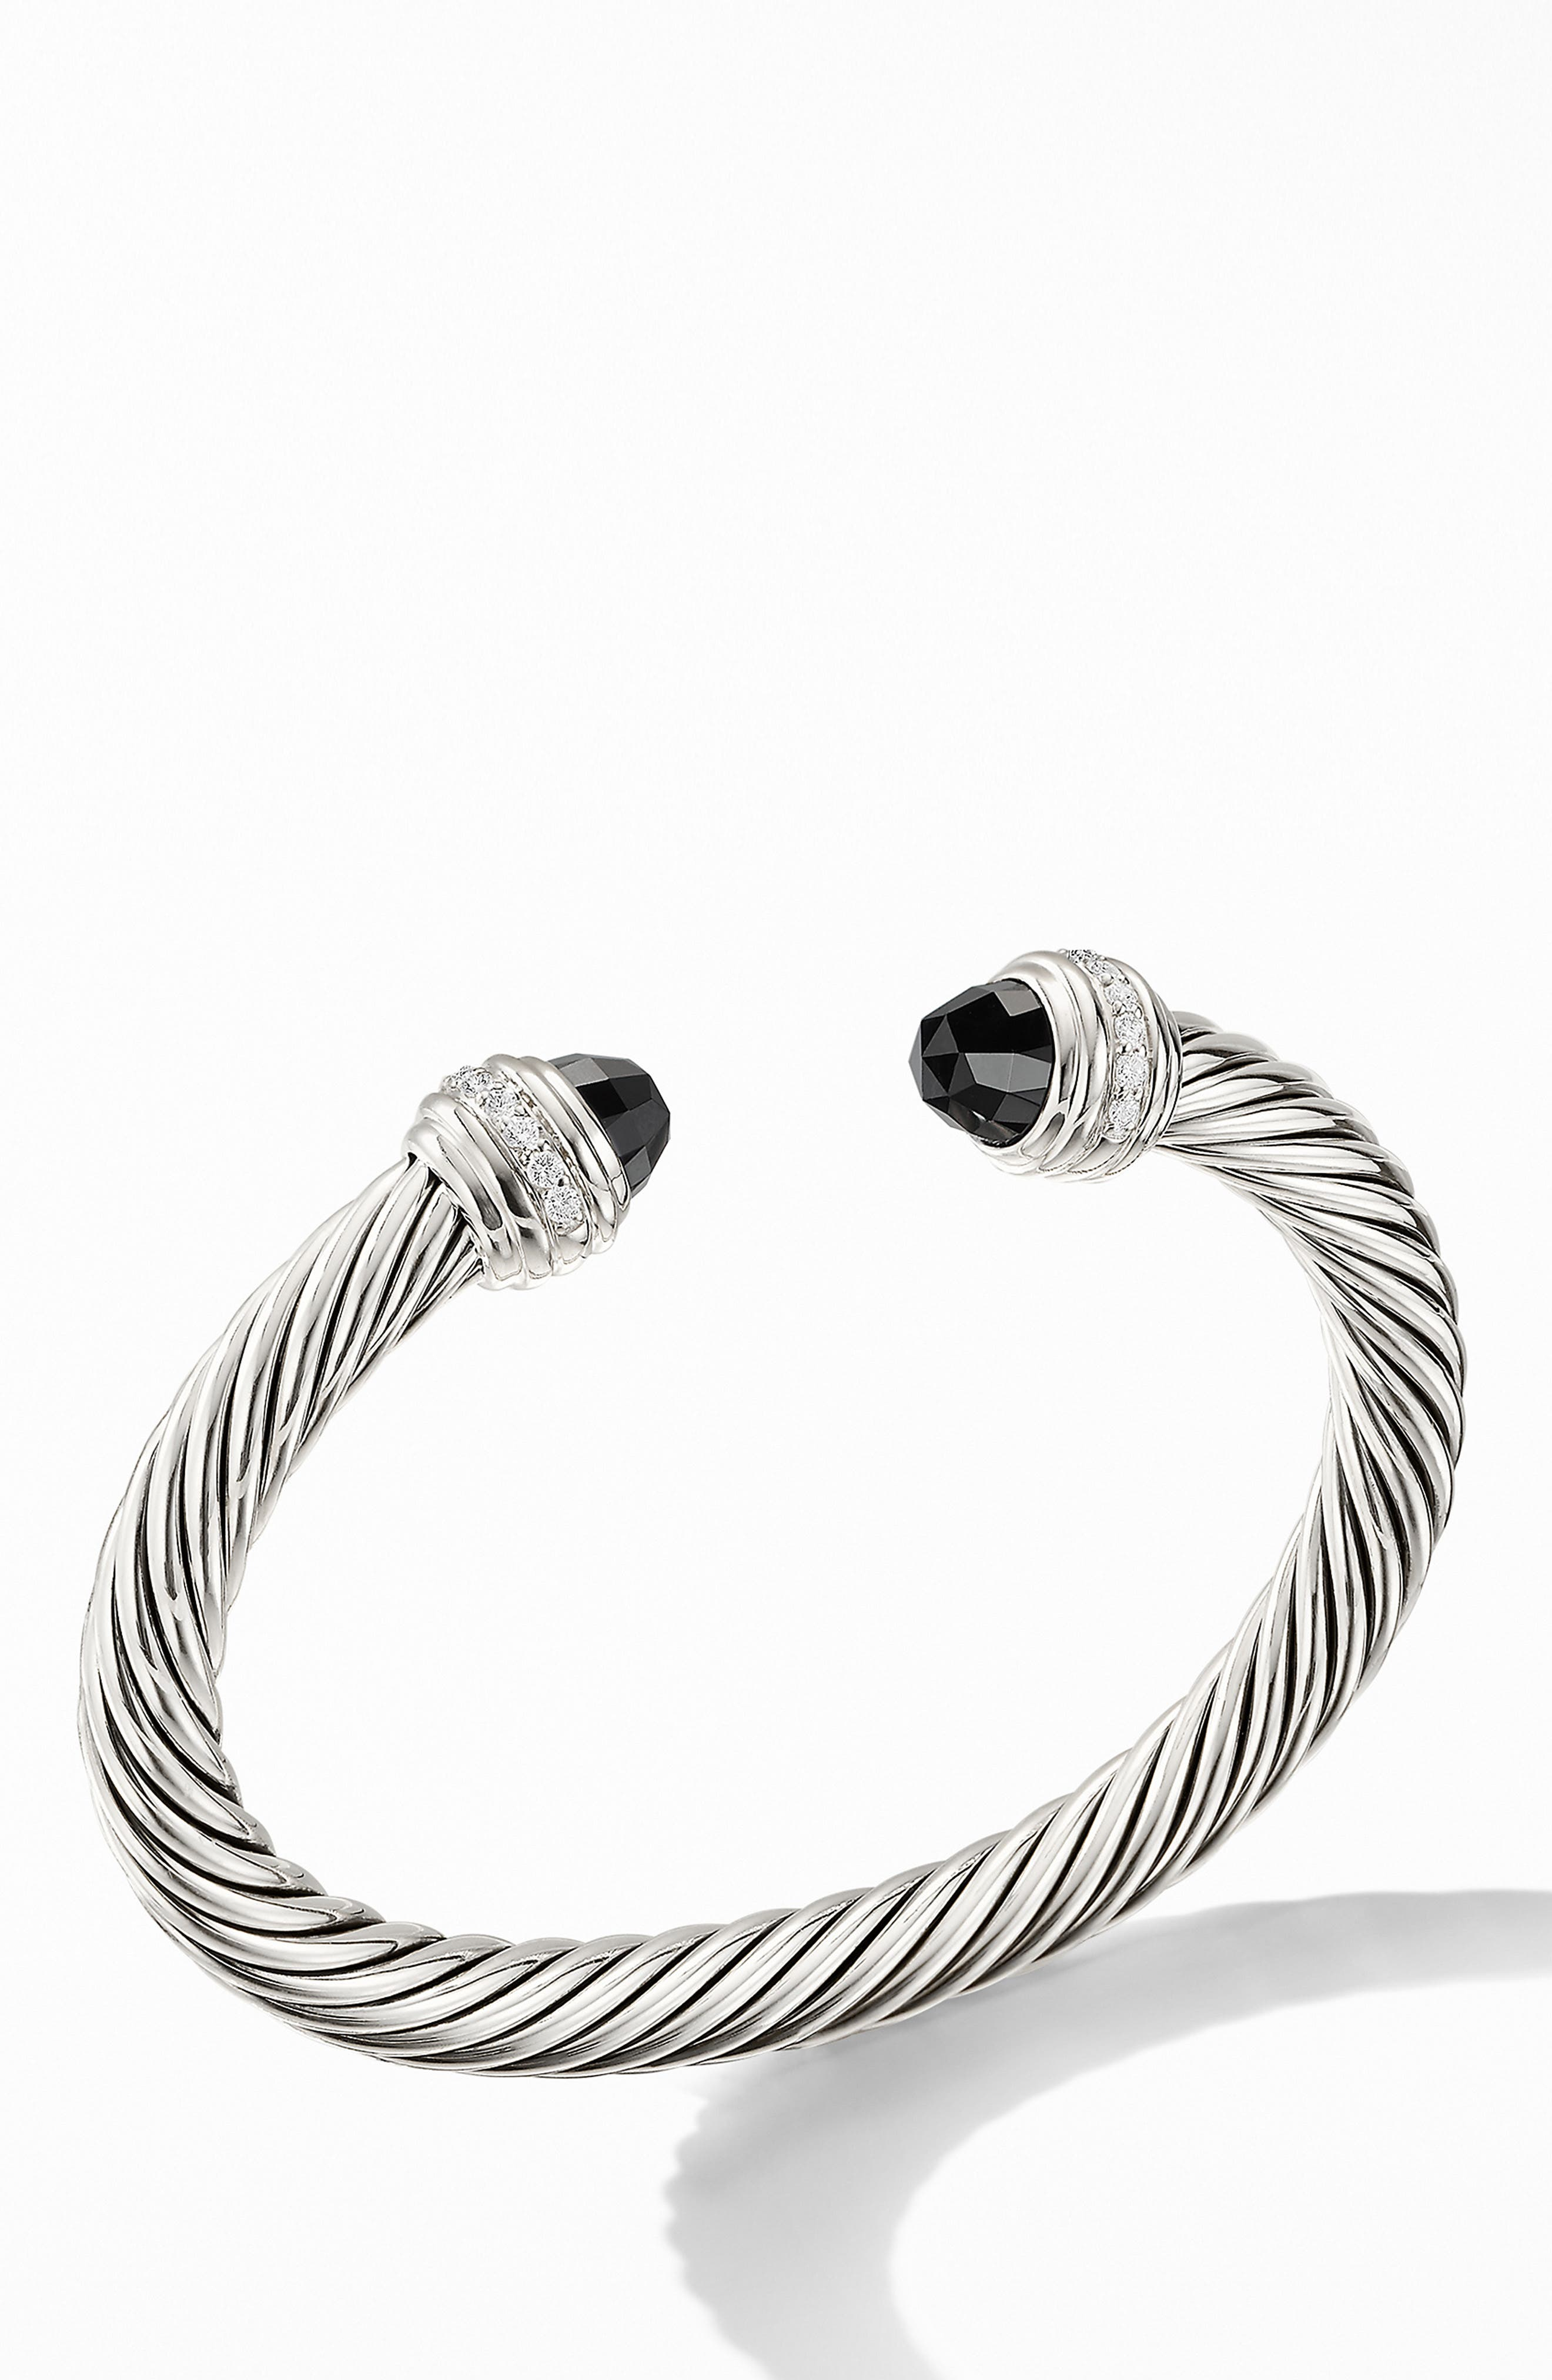 Cable Classics Bracelet with Semiprecious Stones & Diamonds, 7mm,                             Main thumbnail 1, color,                             SILVER/ DIAMOND/ BLACK ONYX